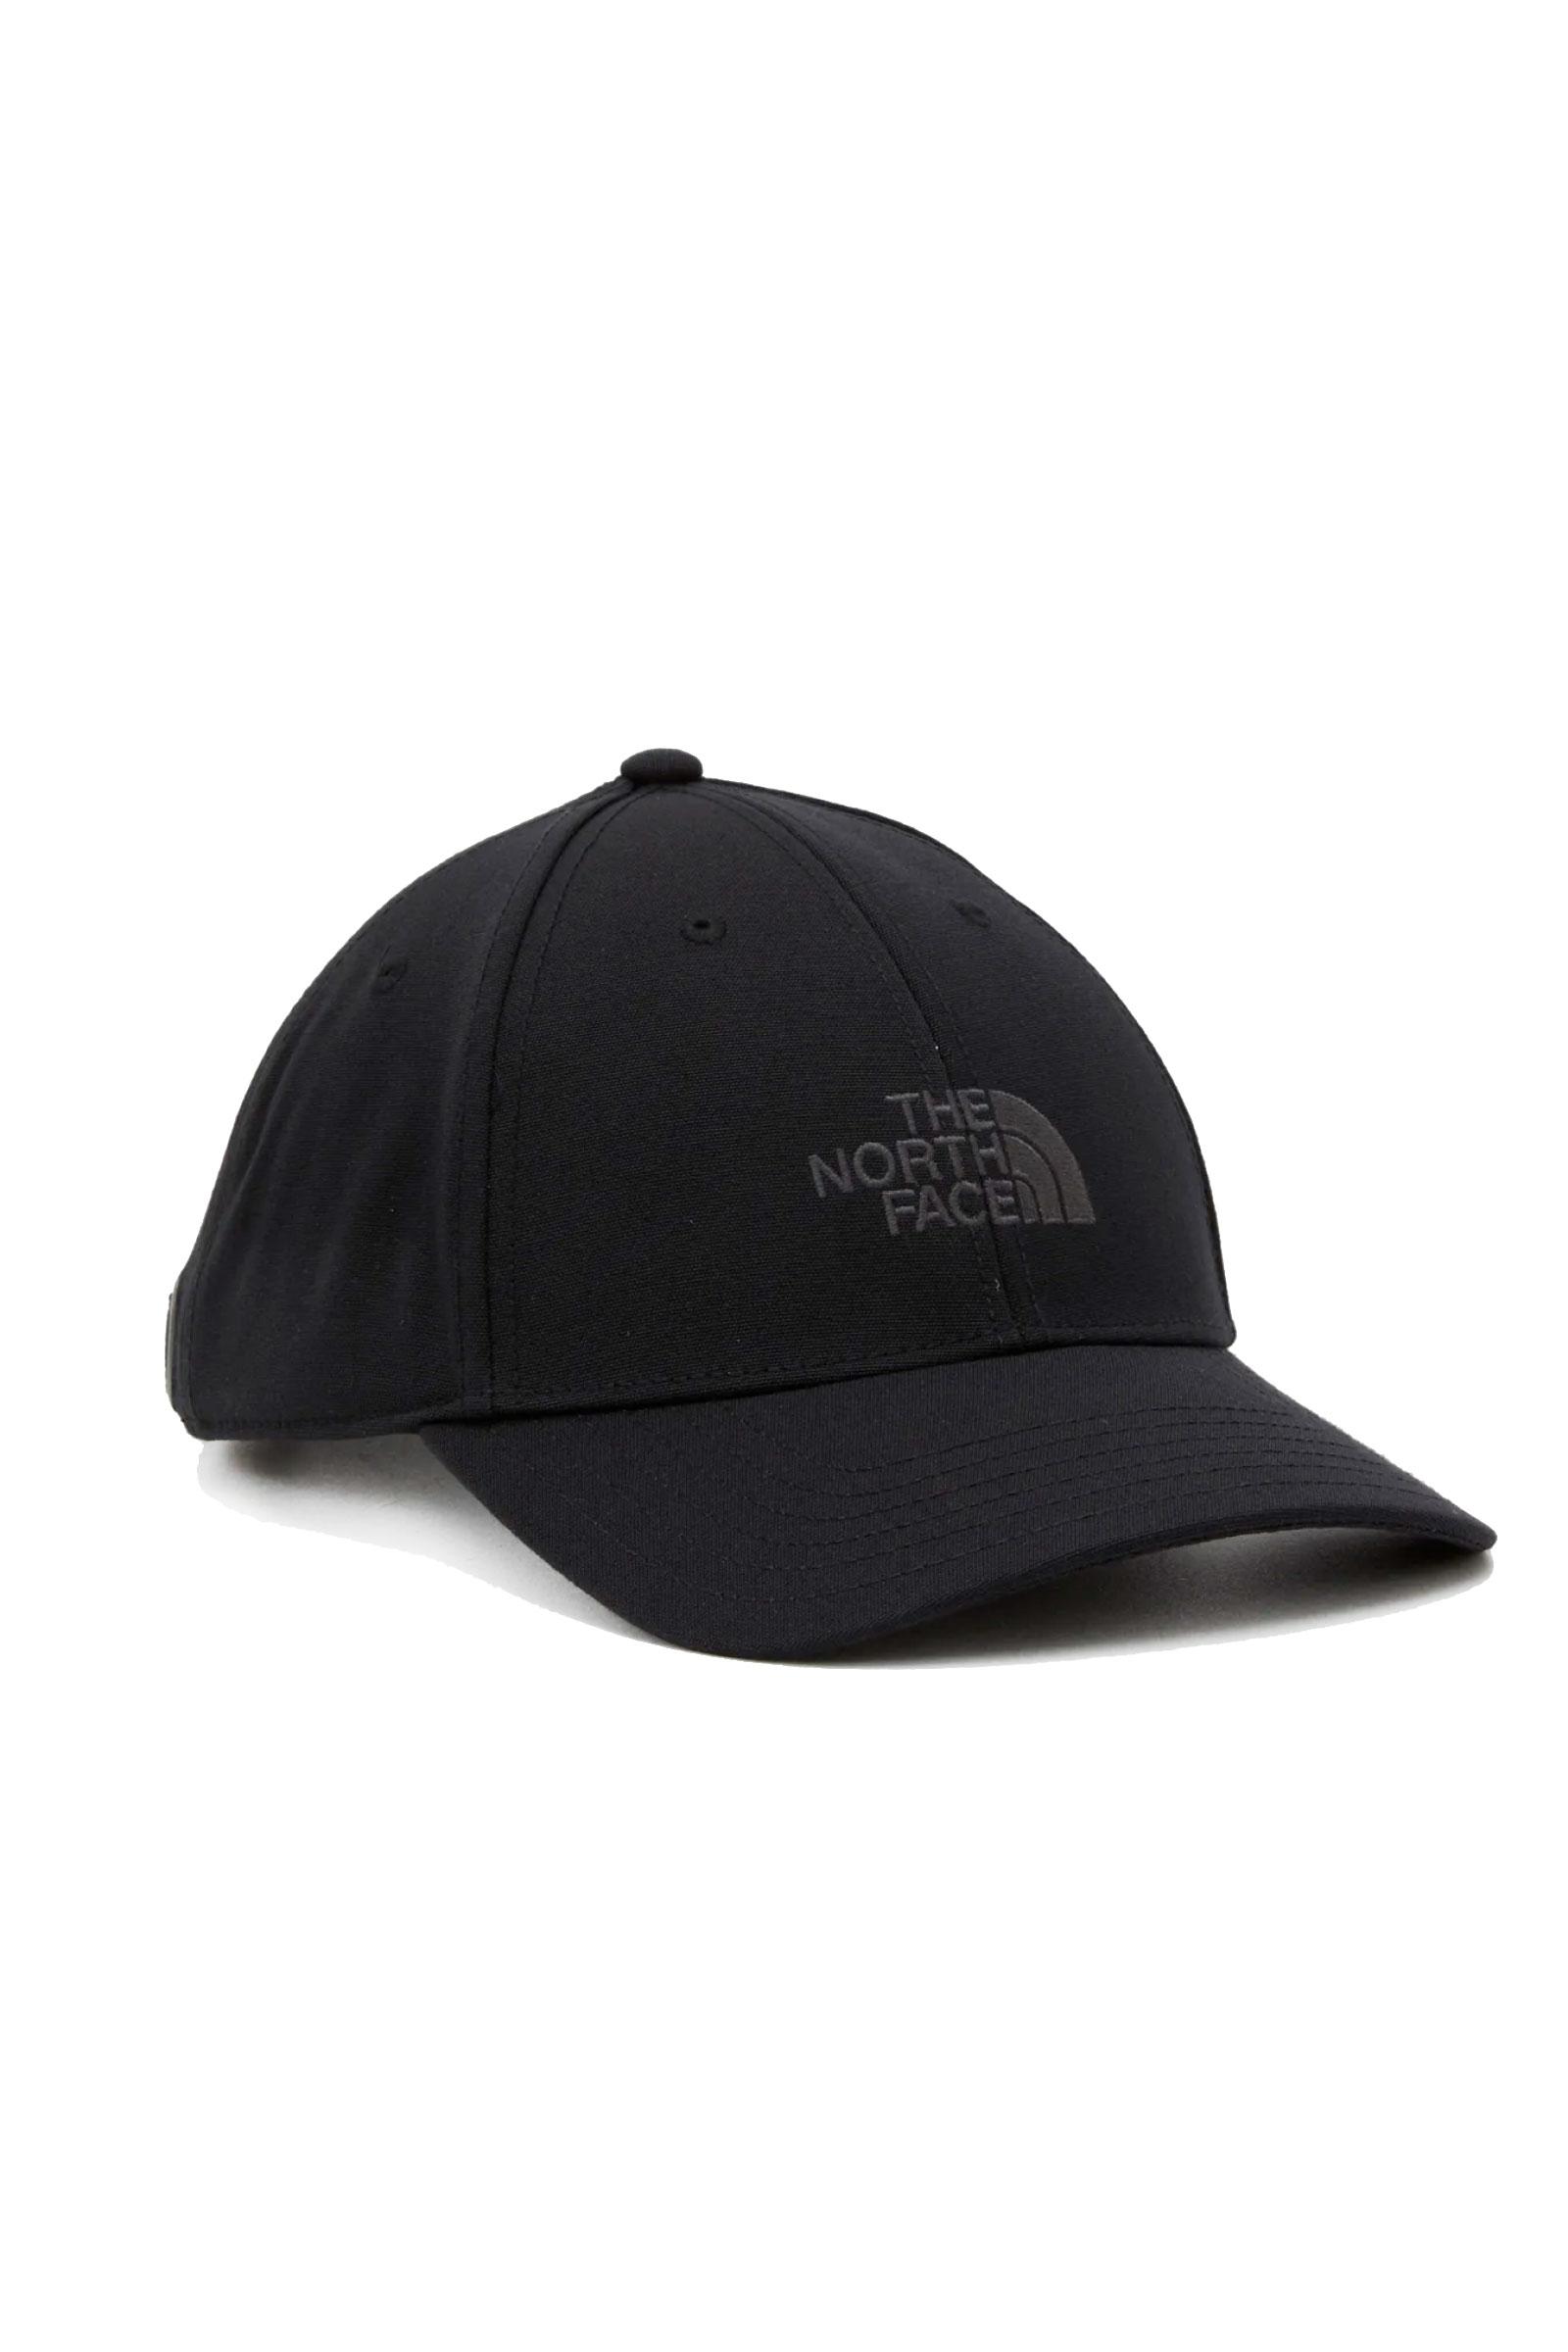 THE NORTH FACE Cappello Unisex THE NORTH FACE | Cappello | NF0A4VSVJK31